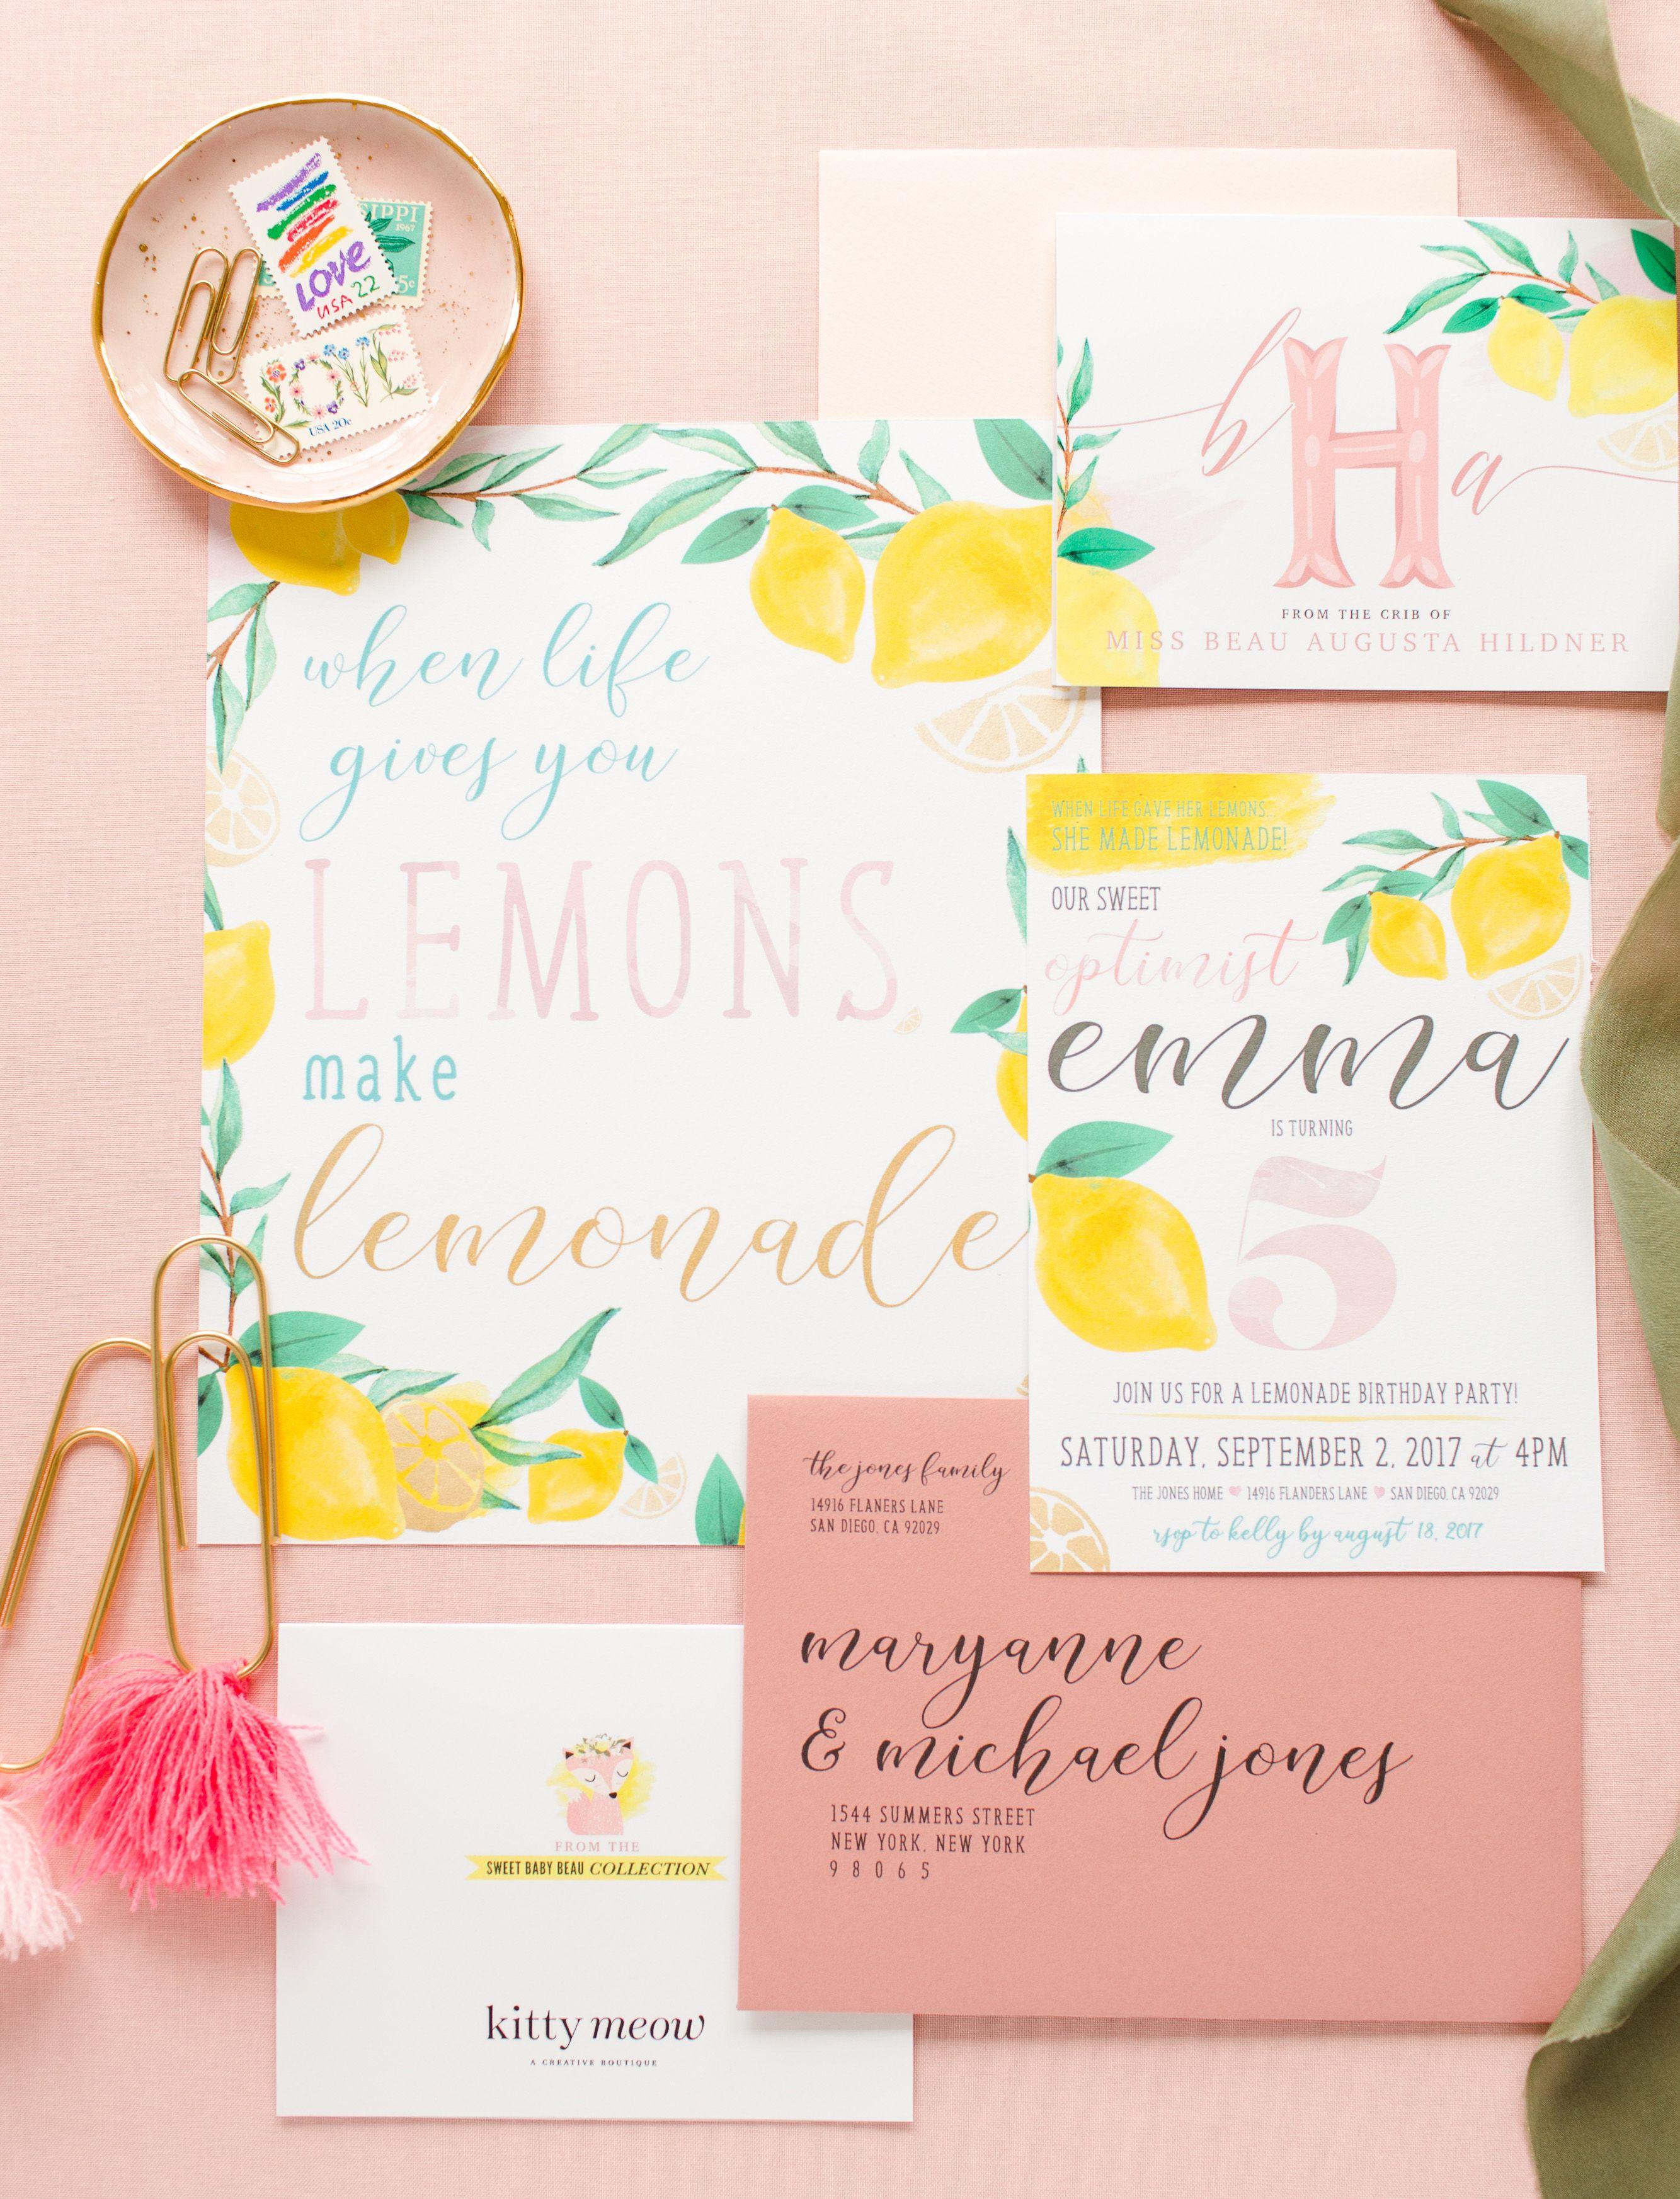 When life gives you lemons, make lemonade! Lemon themed birthday ...